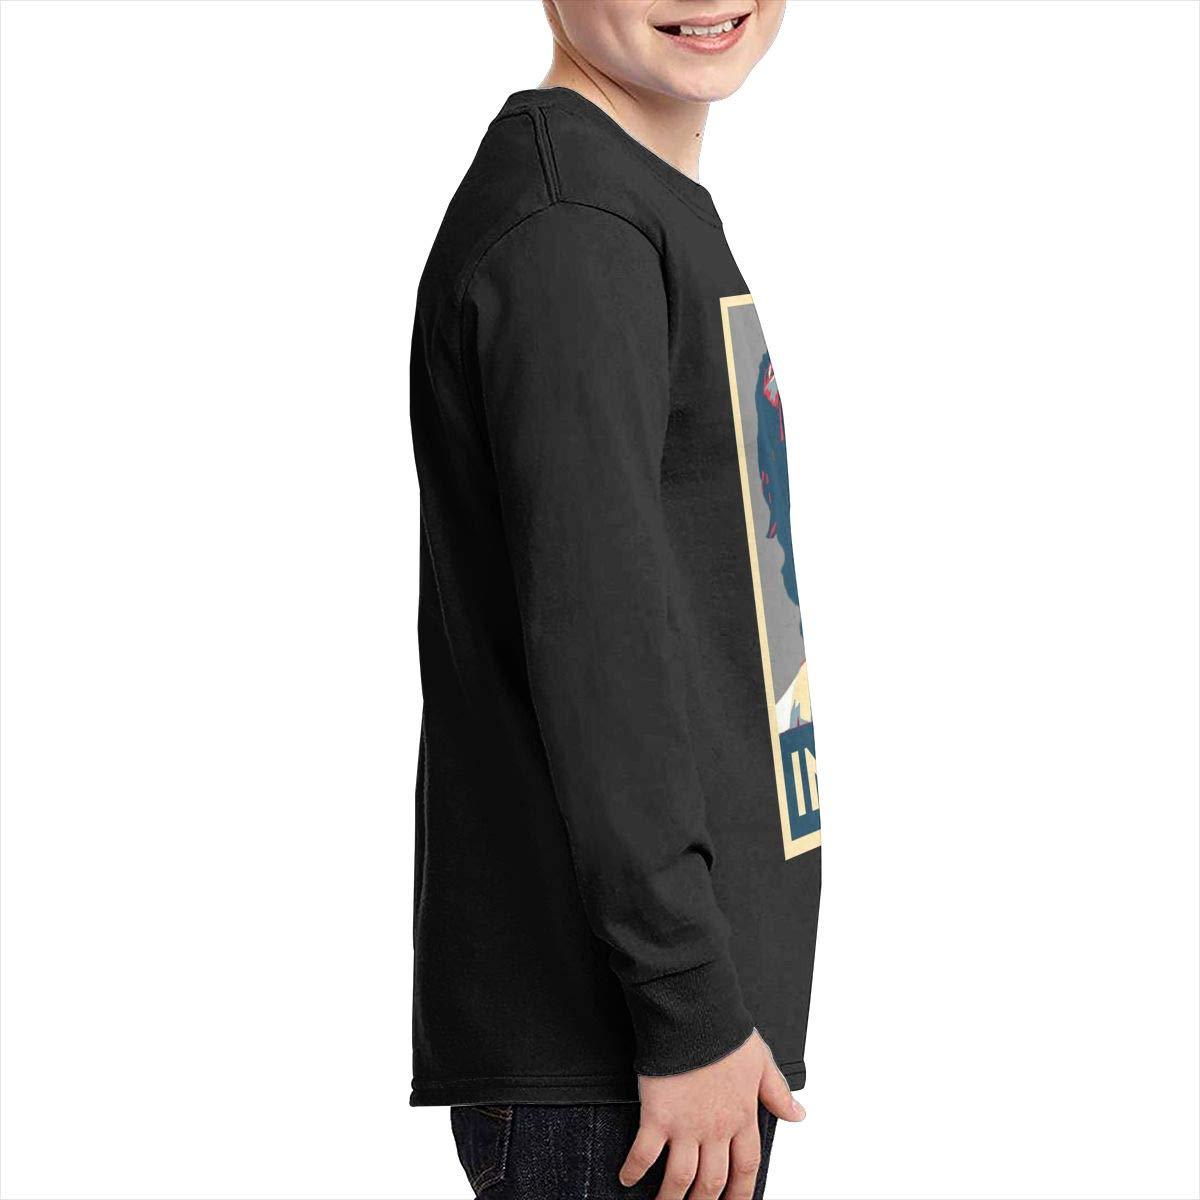 Youth Imagine-Jo-hn Long Sleeves Shirt Boys Girls